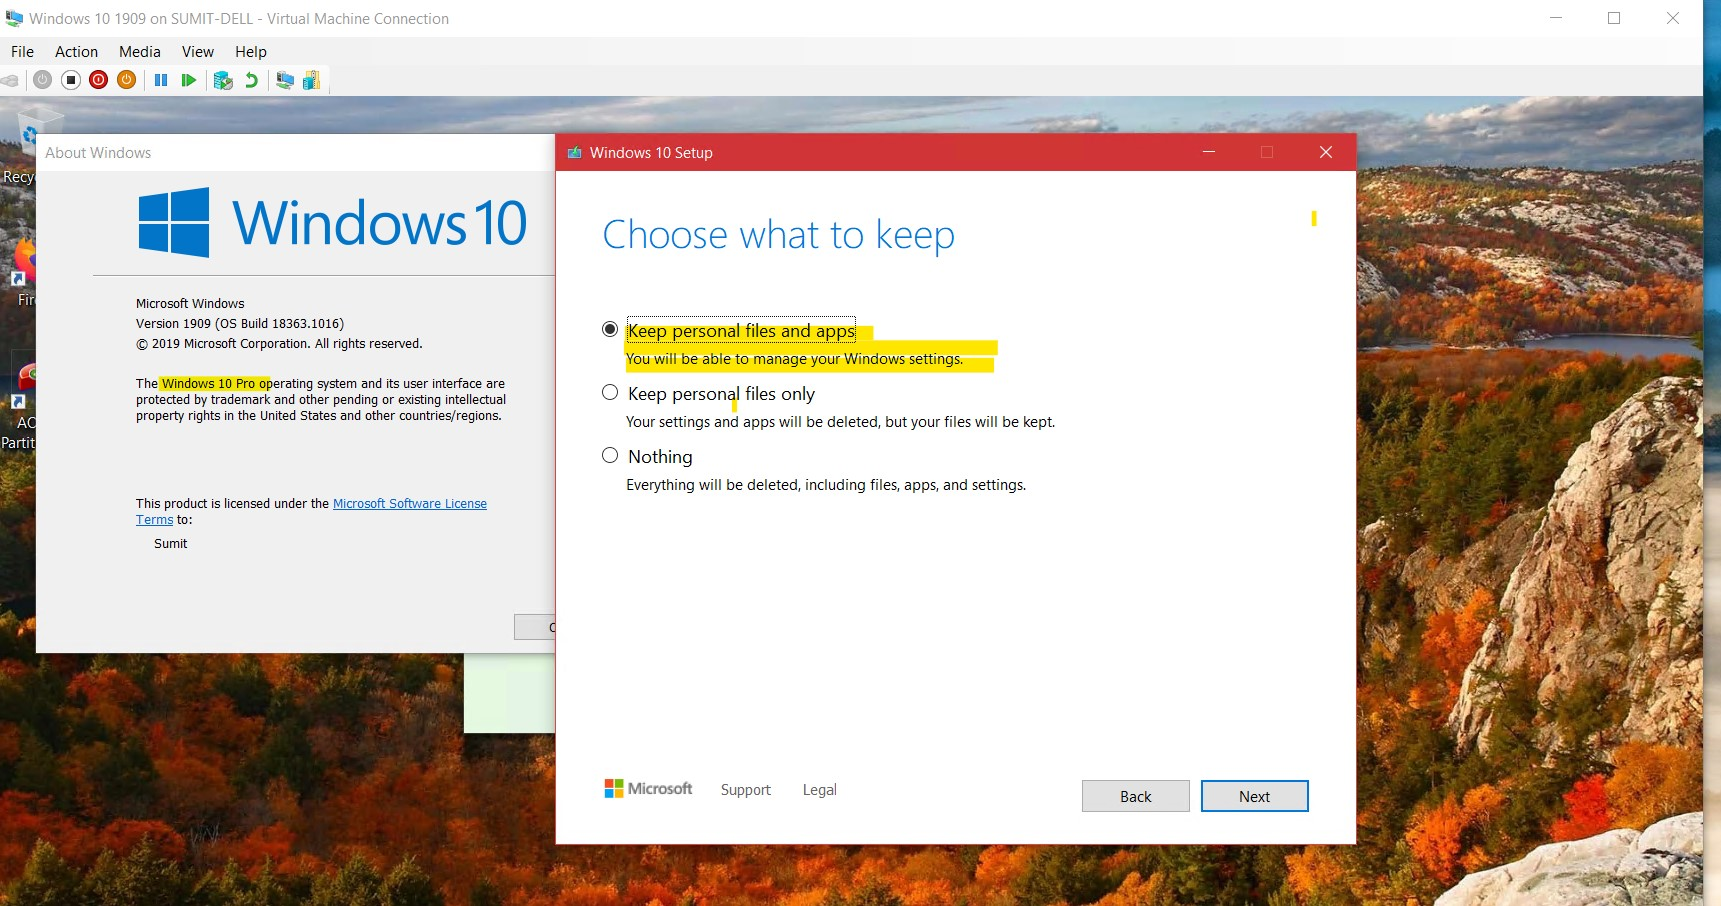 How to downgrade Windows 10 Pro to Windows 10 Home without loosing data ce59f7d3-9e17-4cbc-b023-8ffa4f248b1f?upload=true.jpg